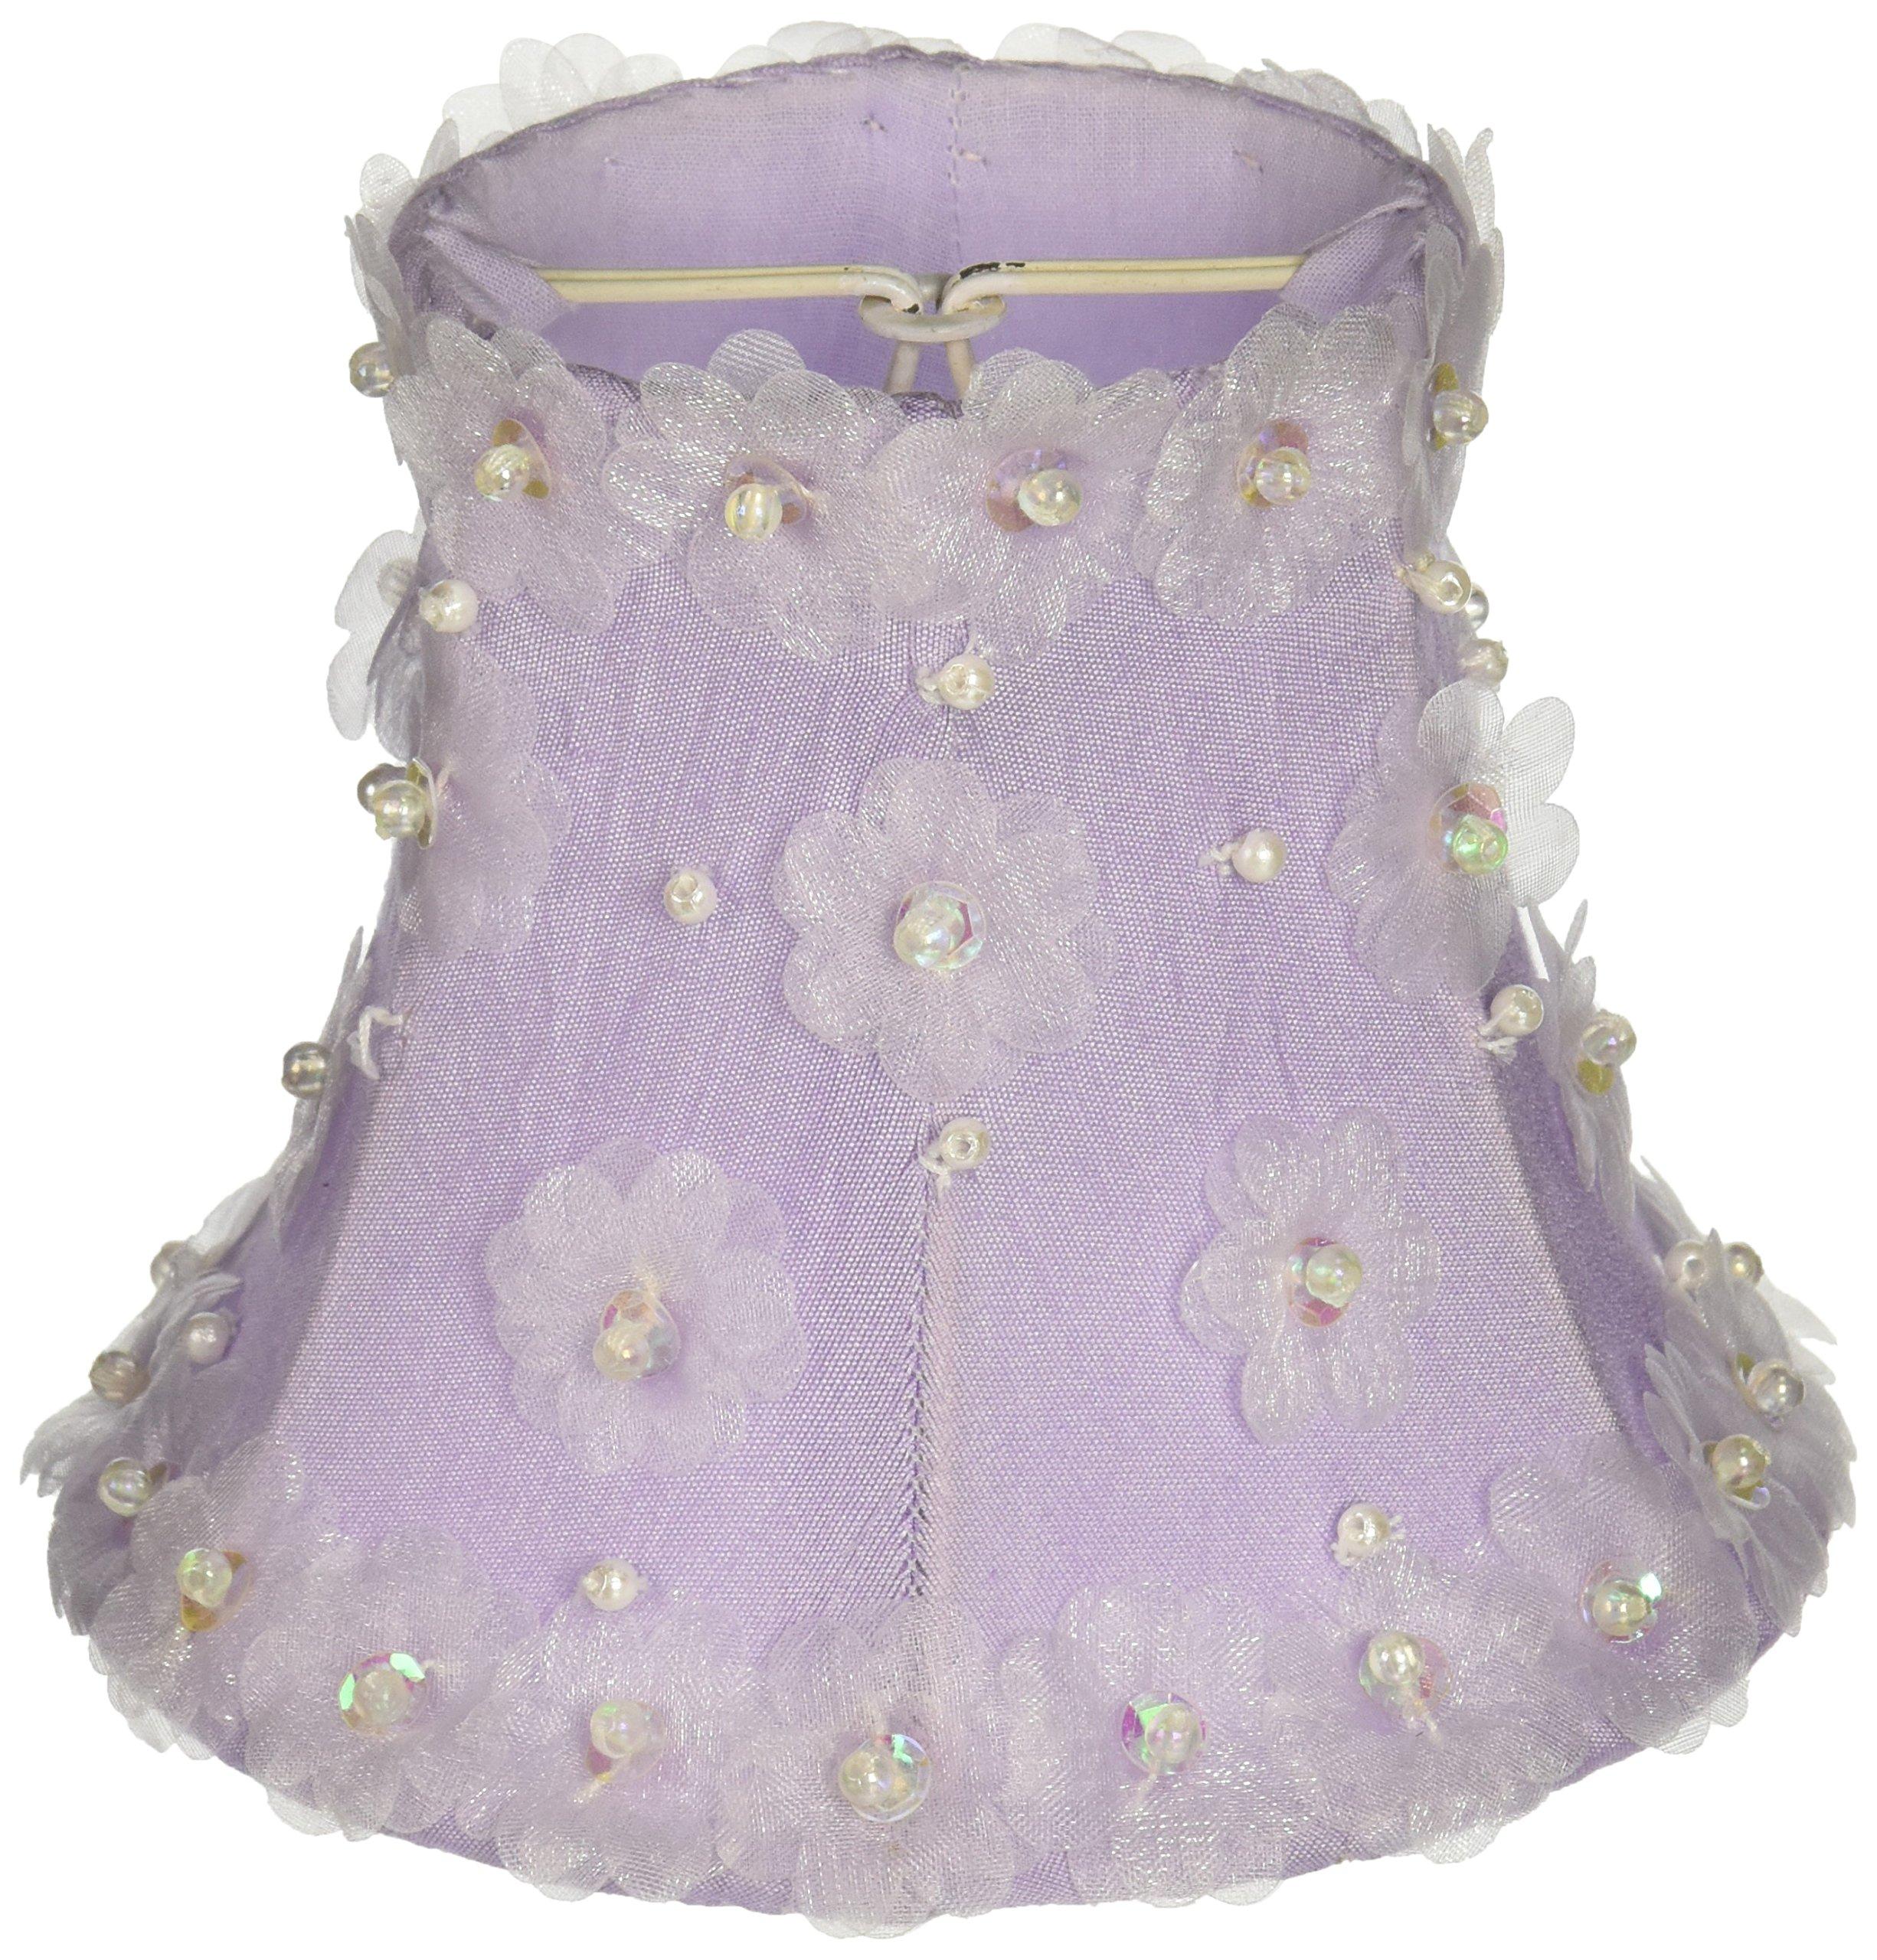 Jubilee Collection 2525 Petal Flower Chandelier Shade, Lavender